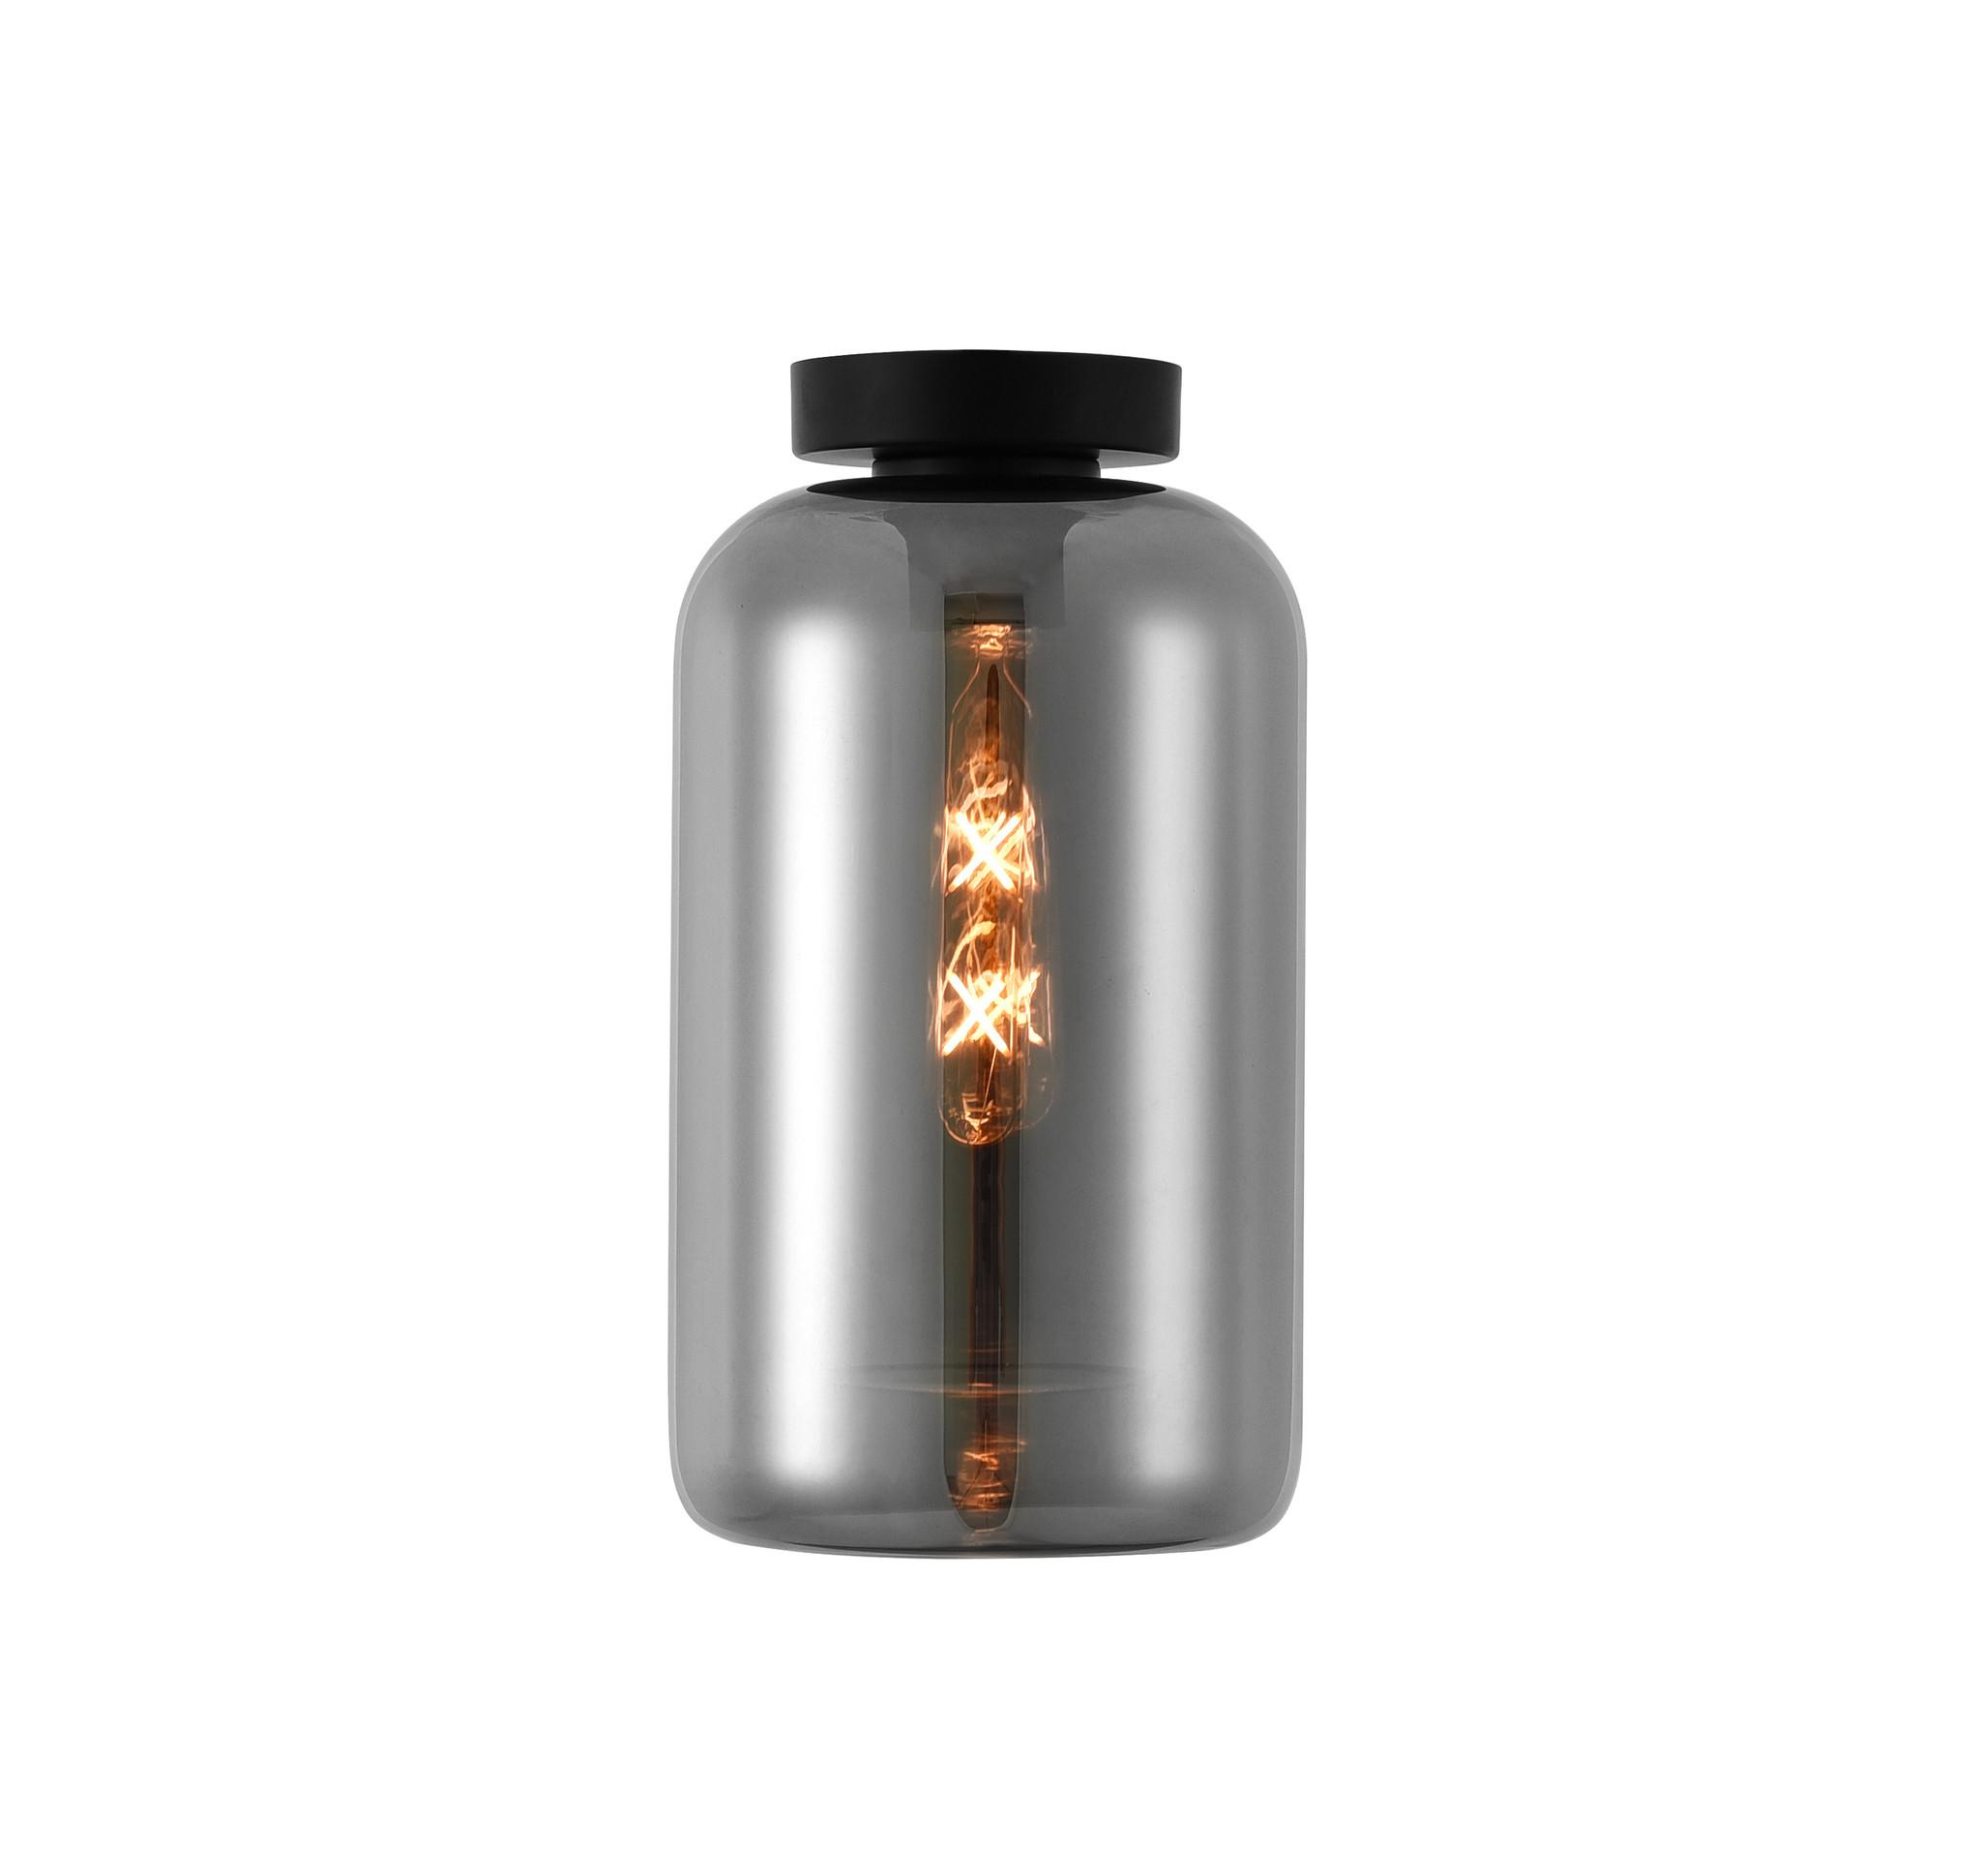 Artdelight Plafondlamp Botany Zwart & Smoke Glas 18cm   Artdelight   8719831735747